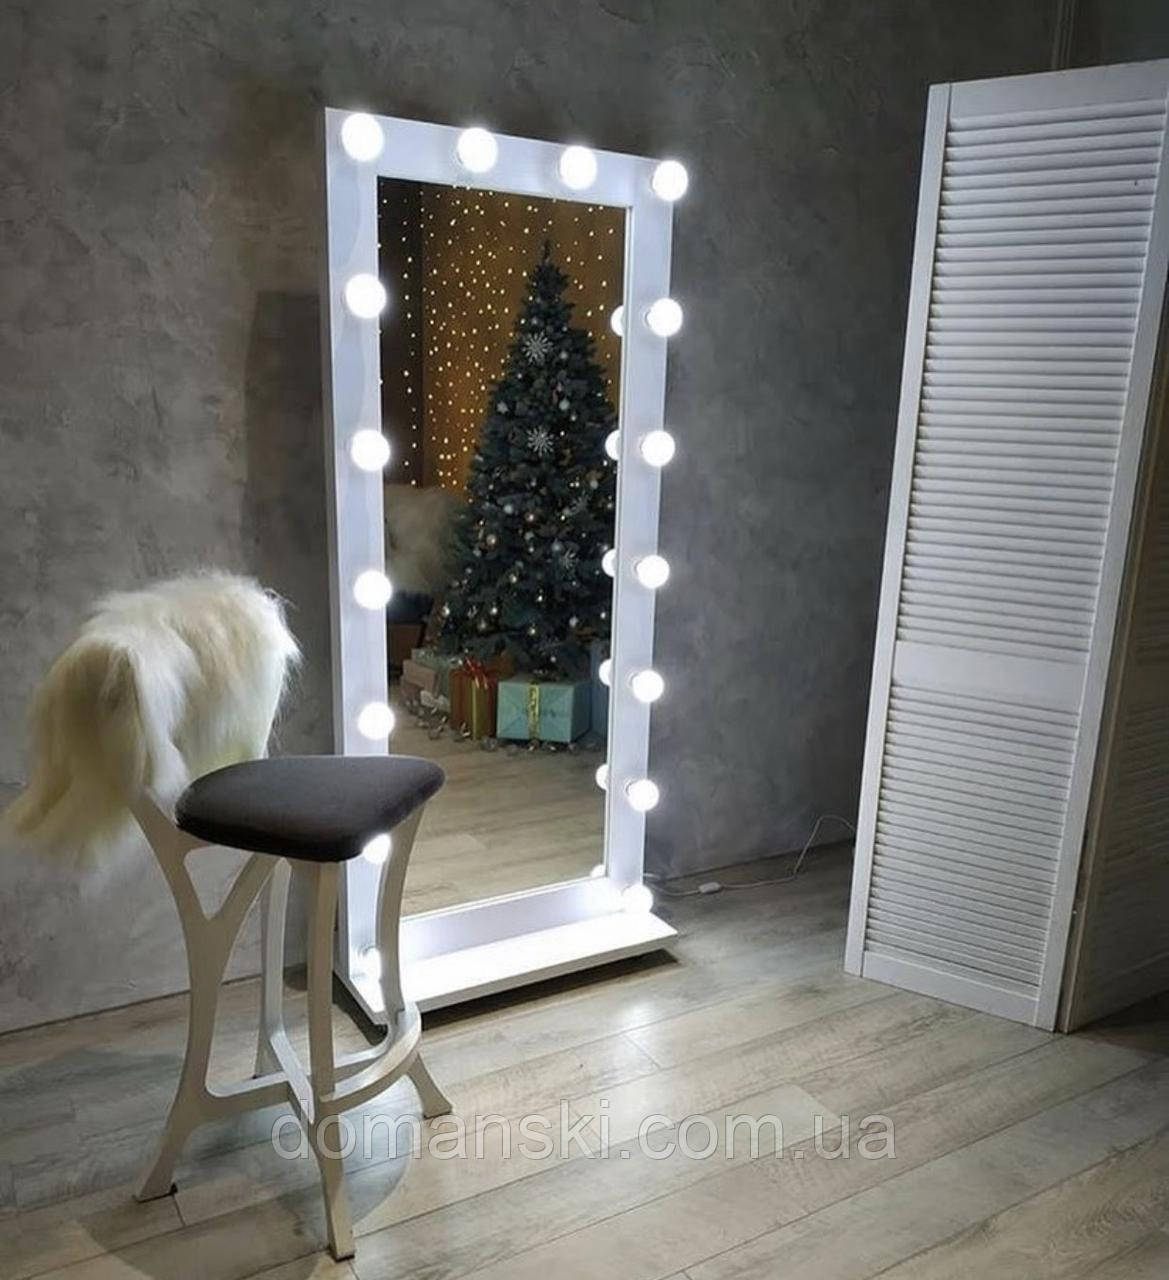 Зеркало напольное с лампами, размер 1800/800 мм. Цвет Белый